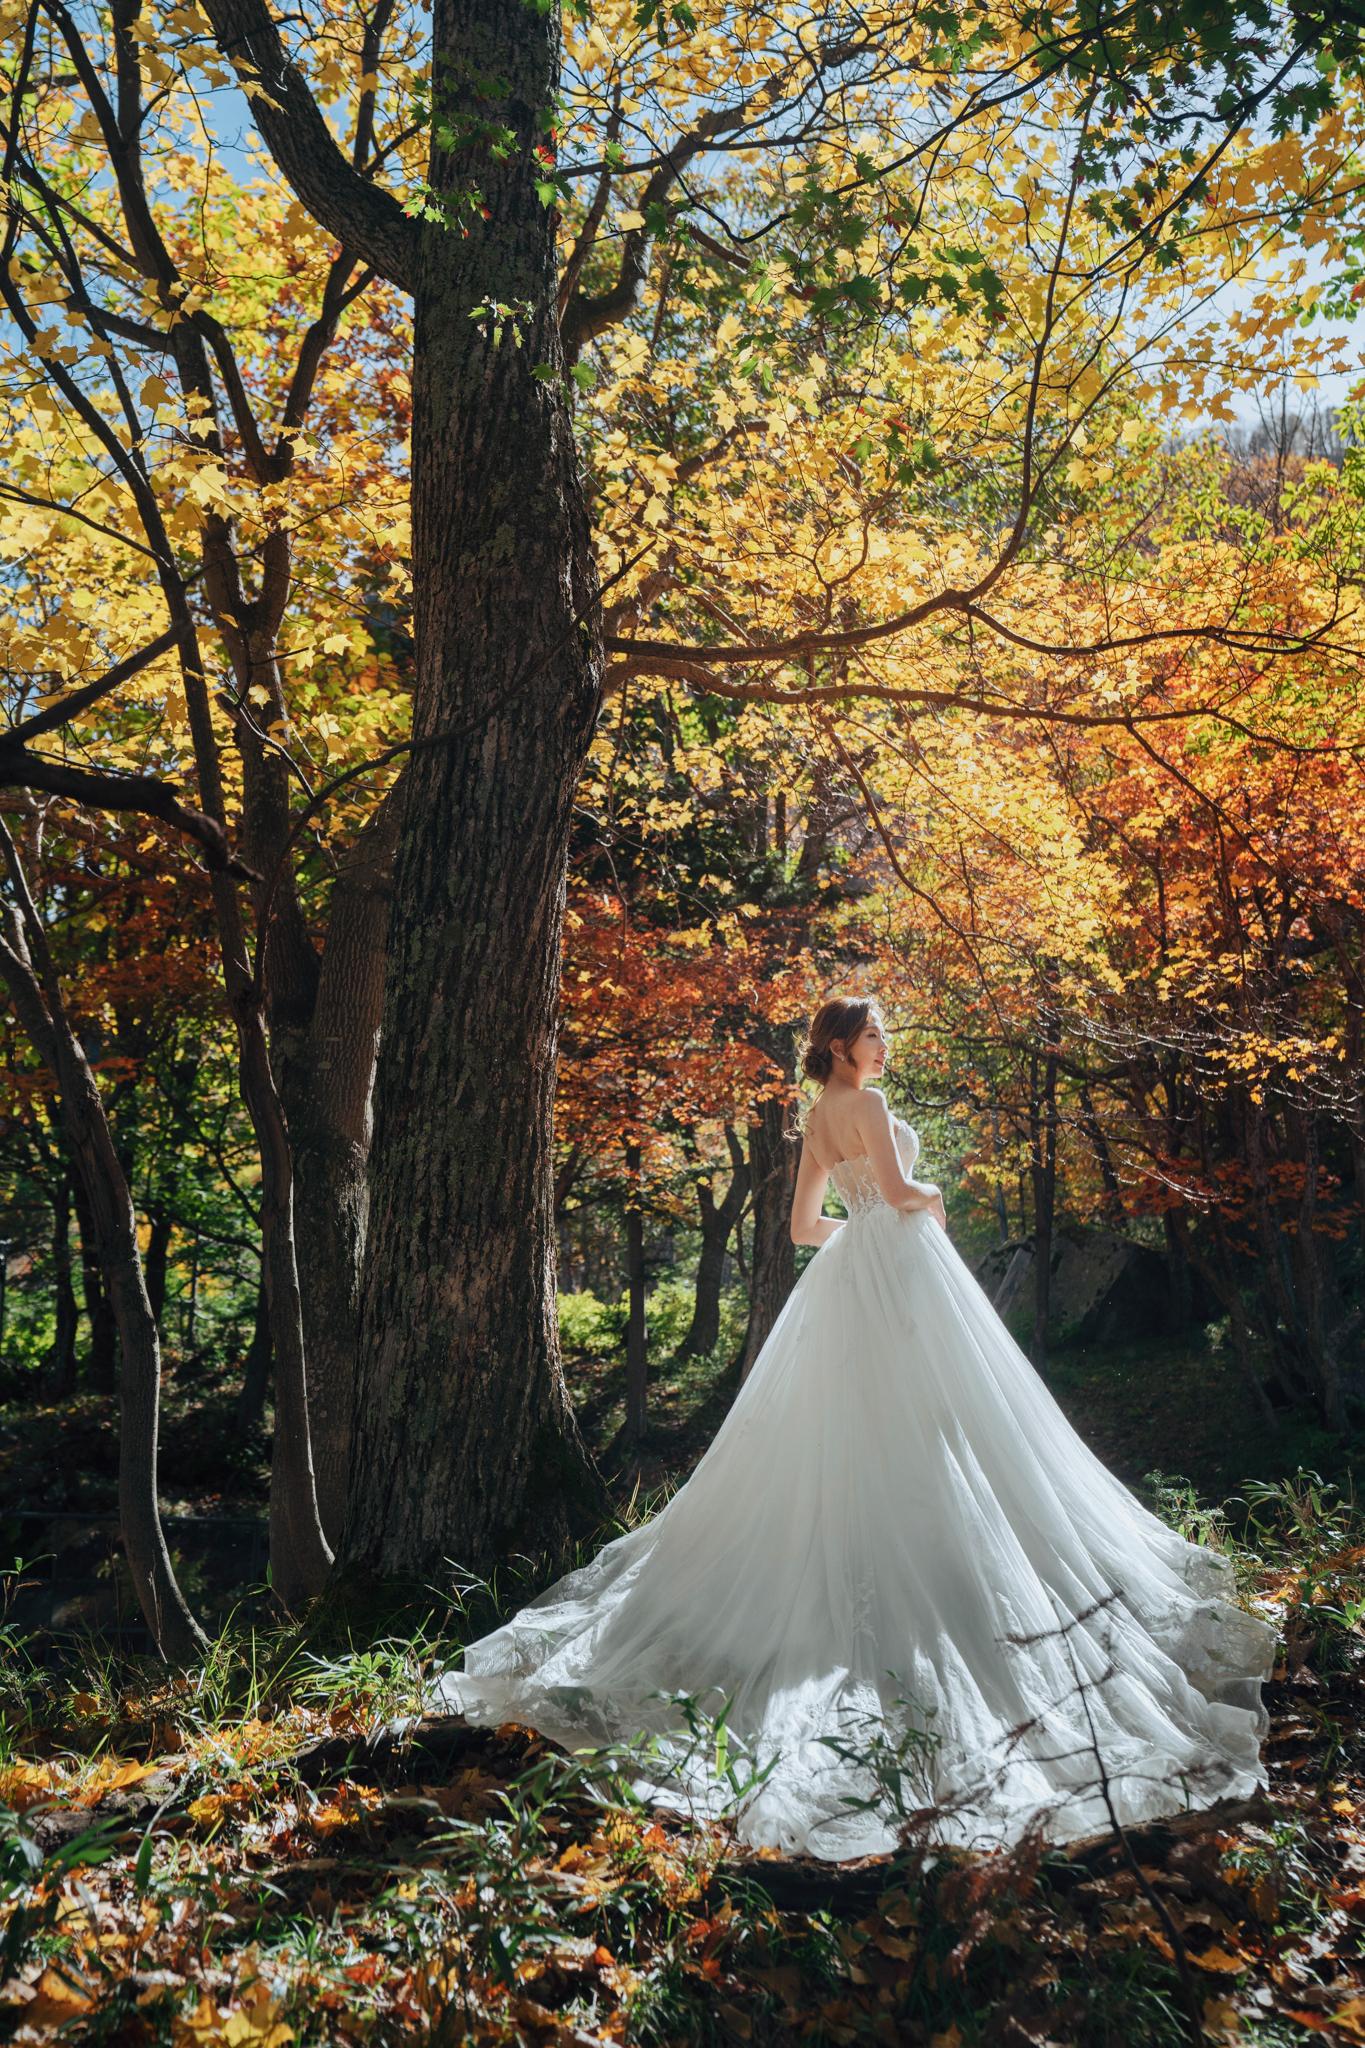 EASTERN WEDDING, Donfer, 海外婚紗, 北海道婚紗, 楓葉